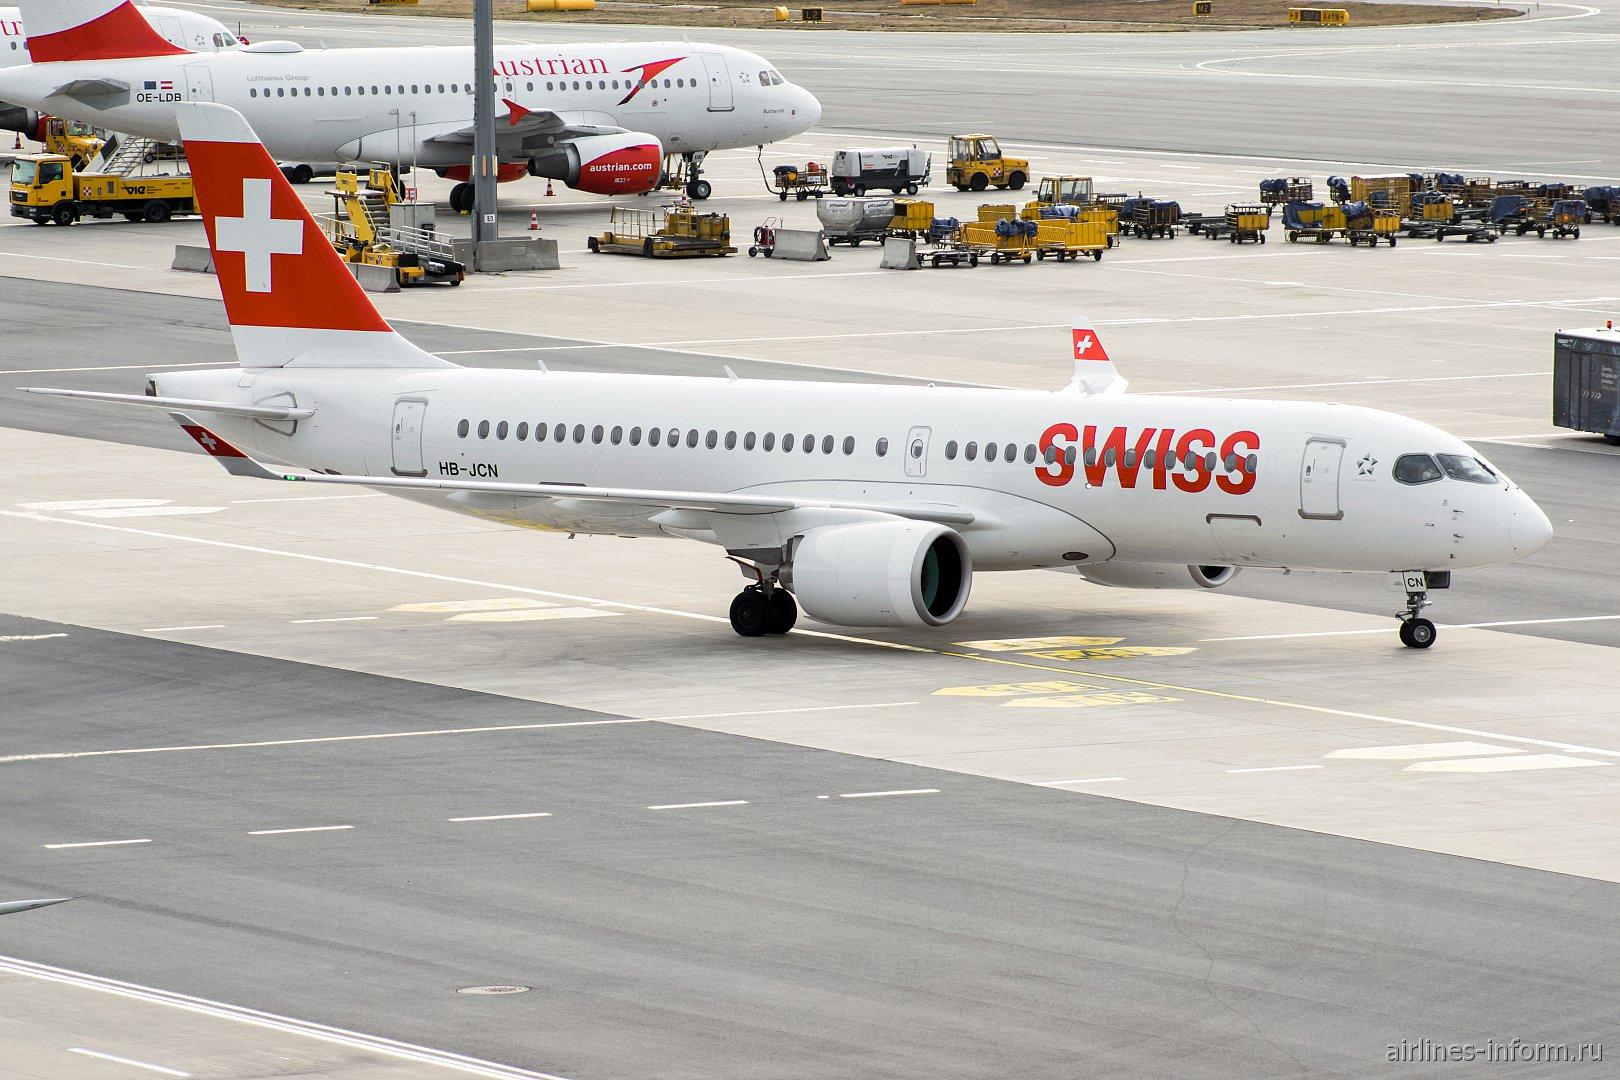 Авиалайнер Airbus A220-300 HB-JCN авиакомпании SWISS в аэропорту Вены